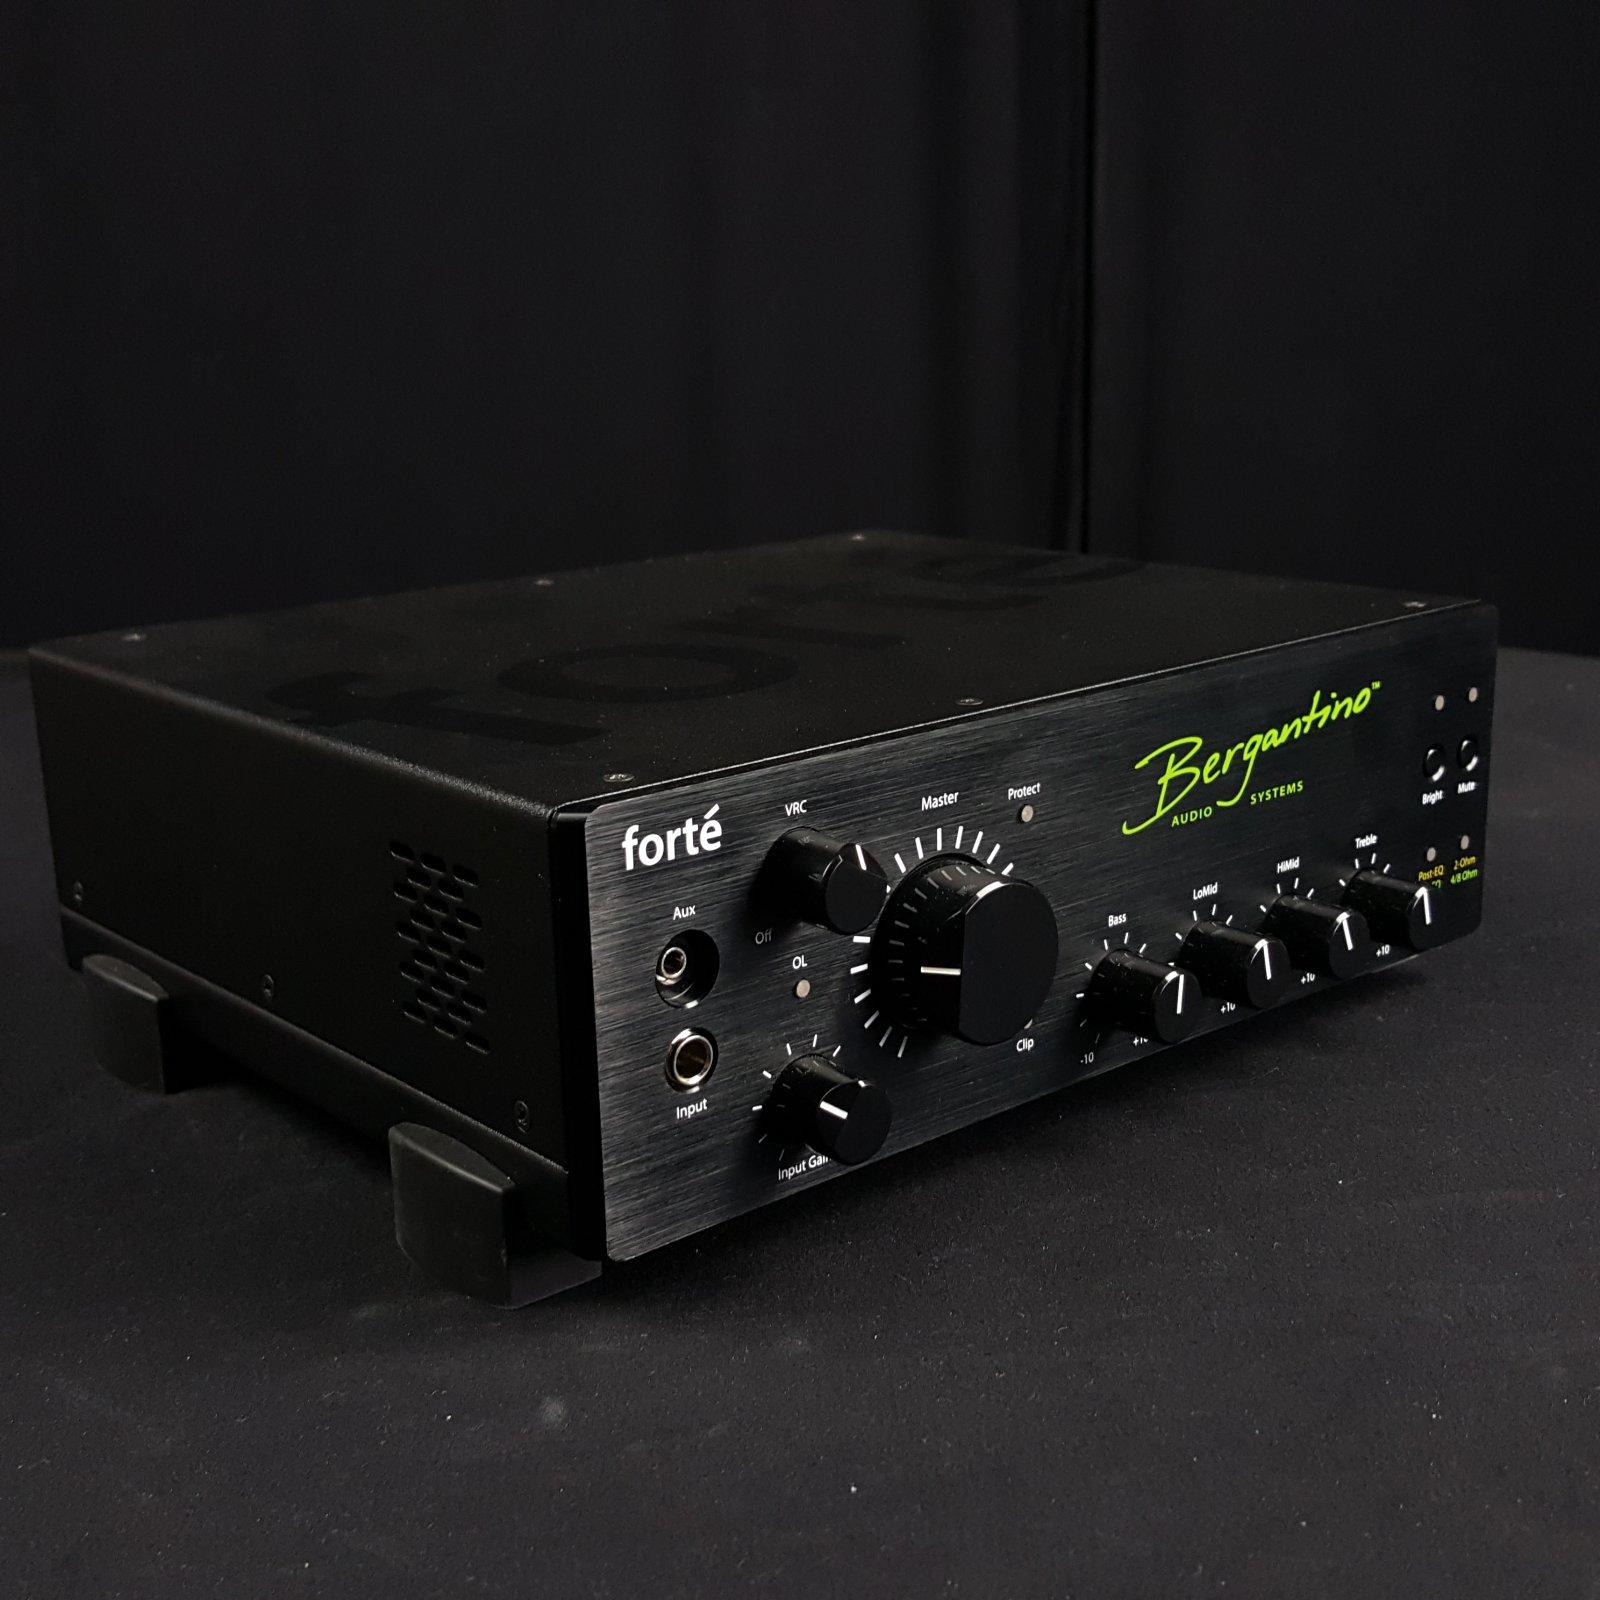 Bergantino Forte 700 Watt Digital Bass Amplifier